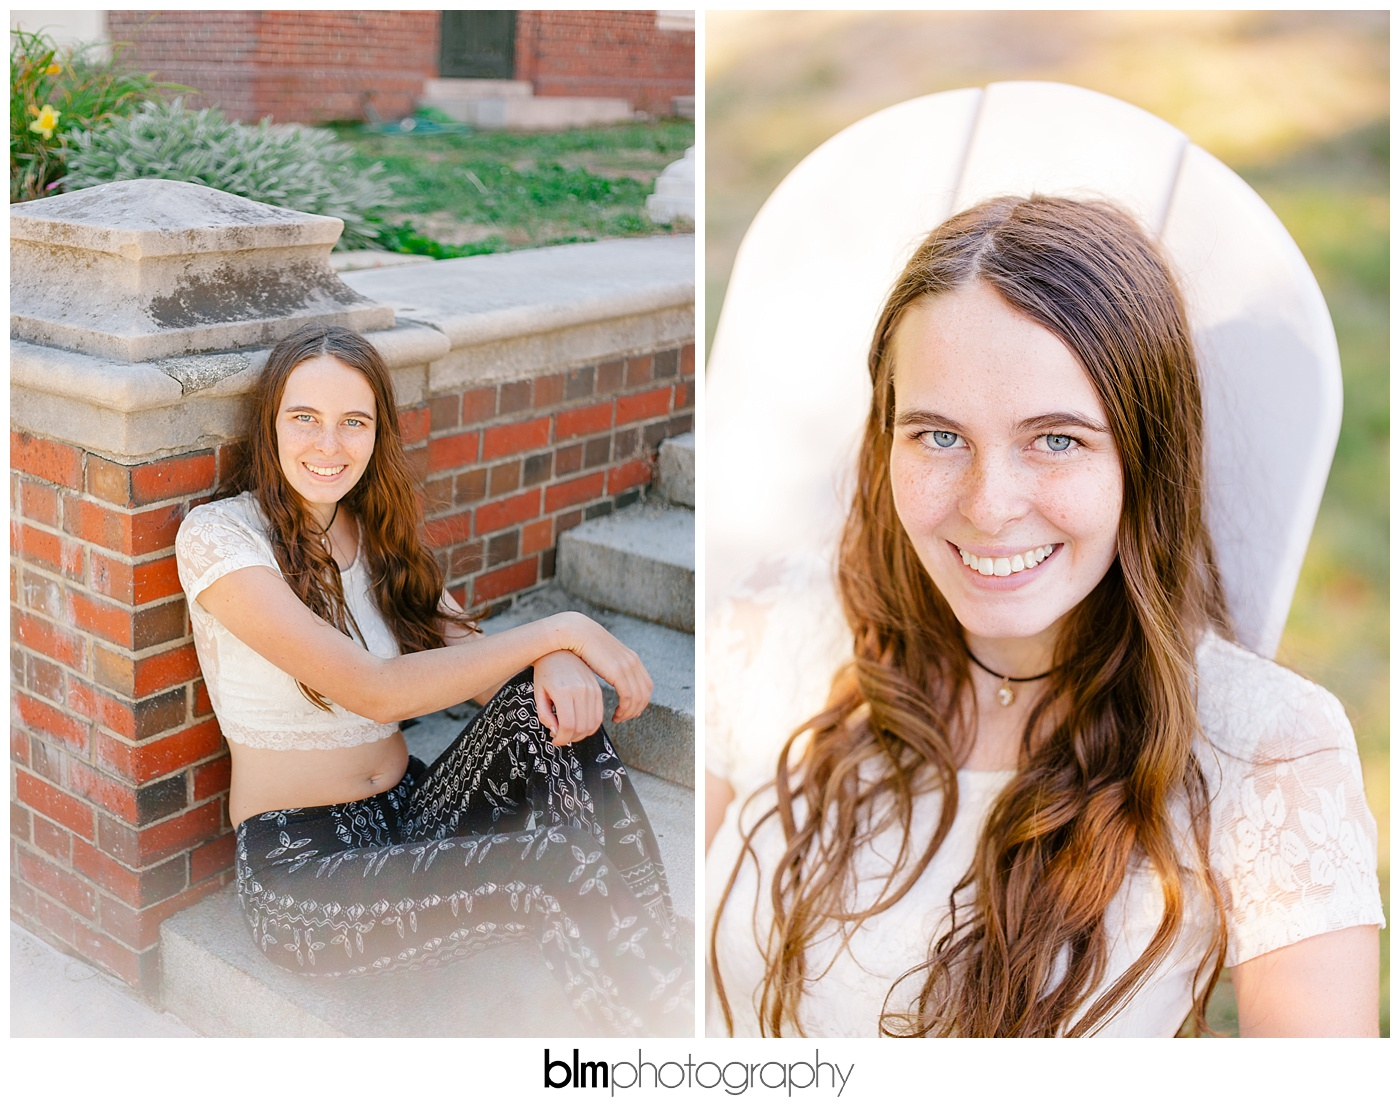 Carly-Cresta_Senior-Portraits_091516-0798.jpg